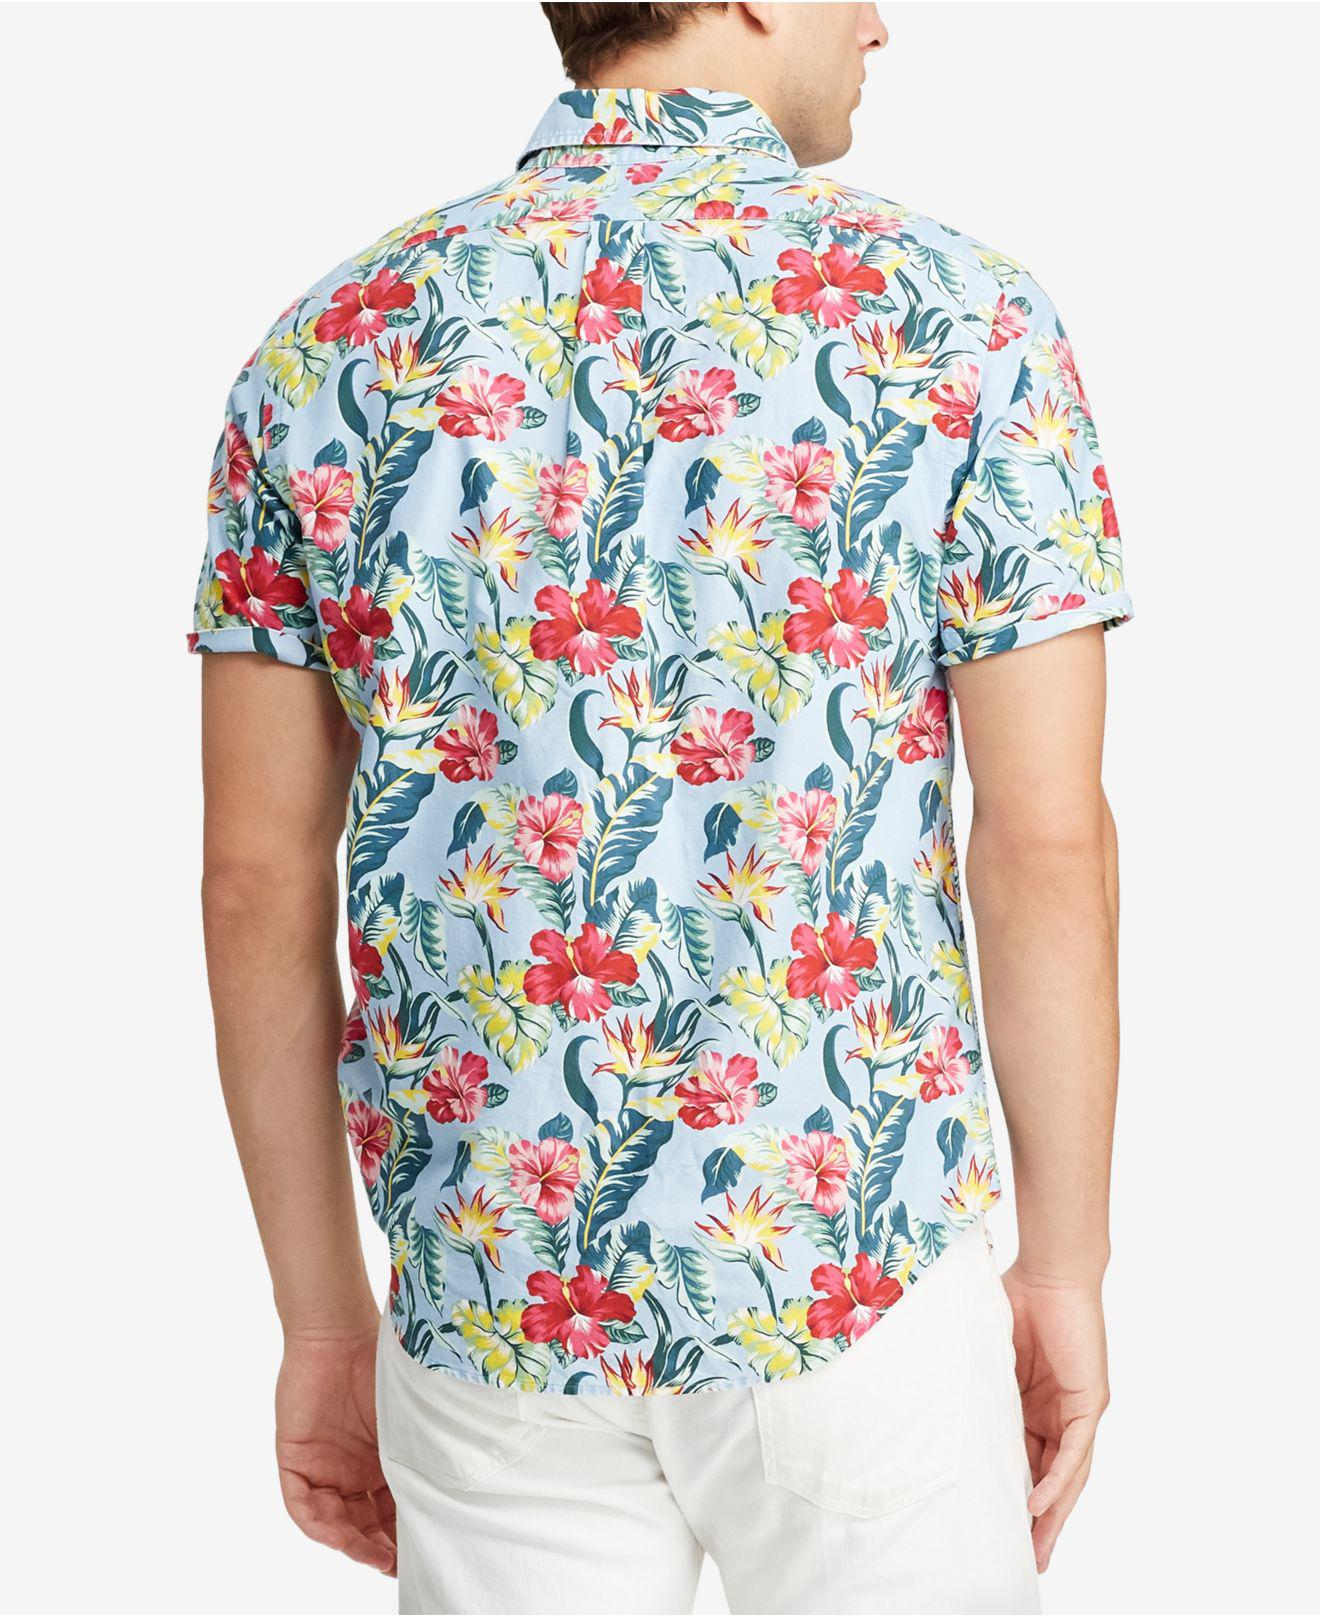 a87beda6c233d Lyst - Polo Ralph Lauren Classic Fit Hawaiian Shirt in Blue for Men